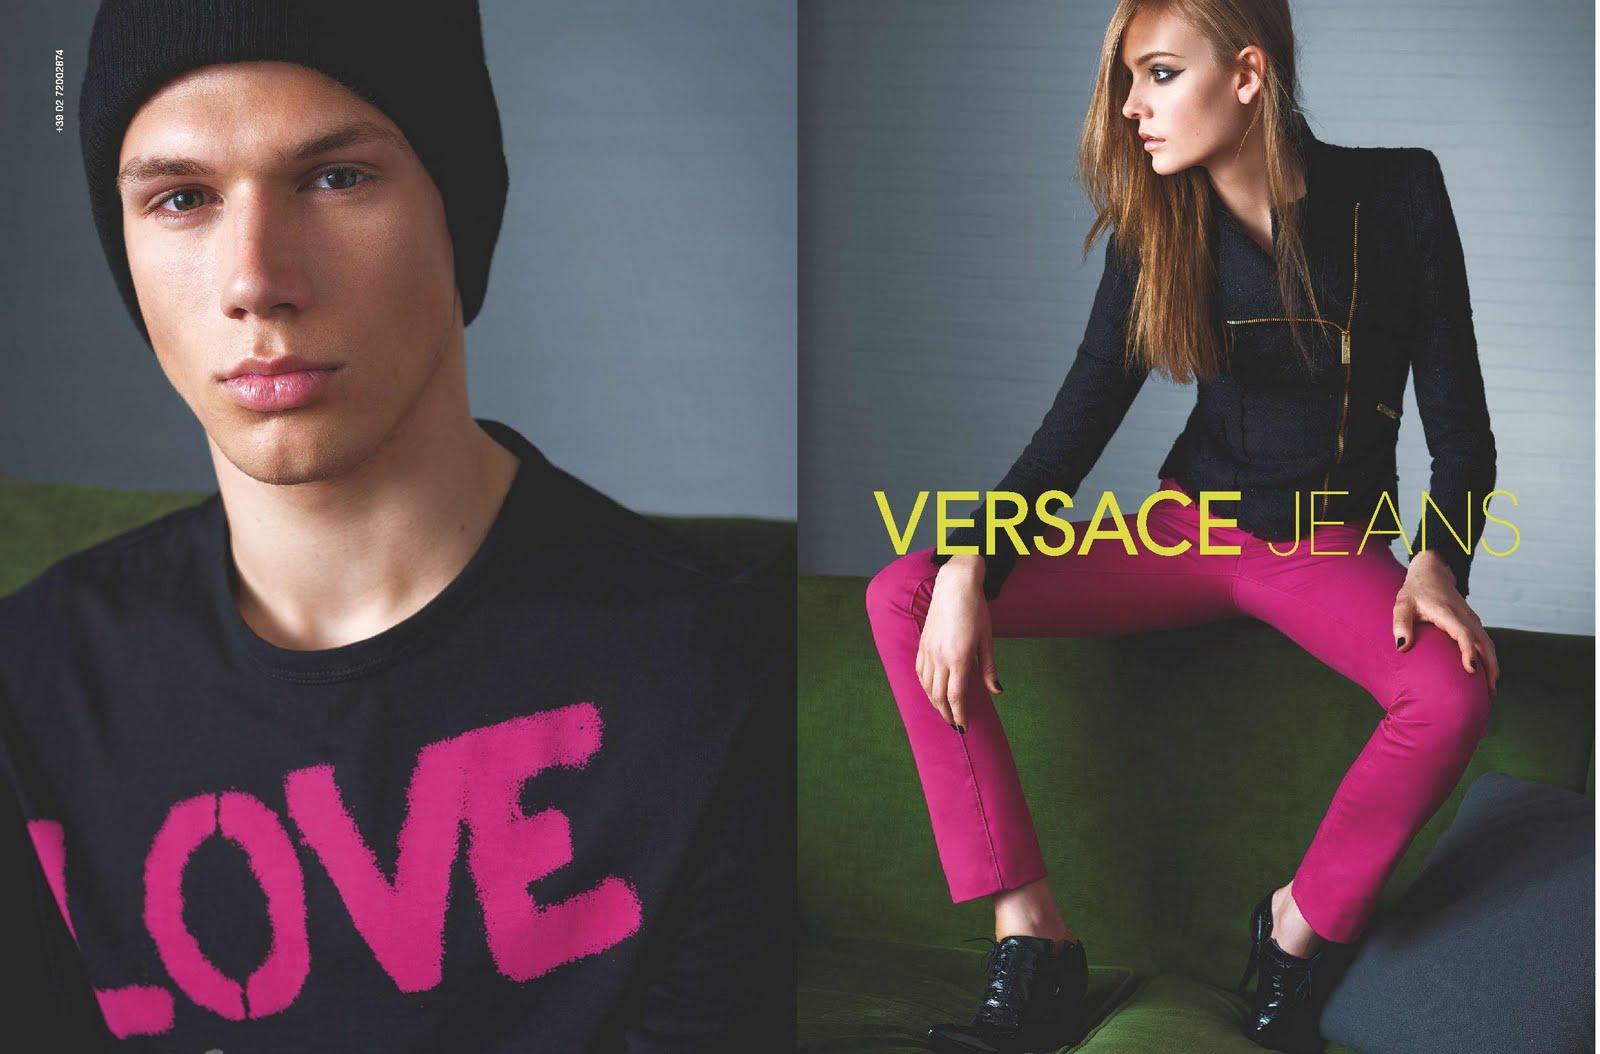 Versace jeans 2